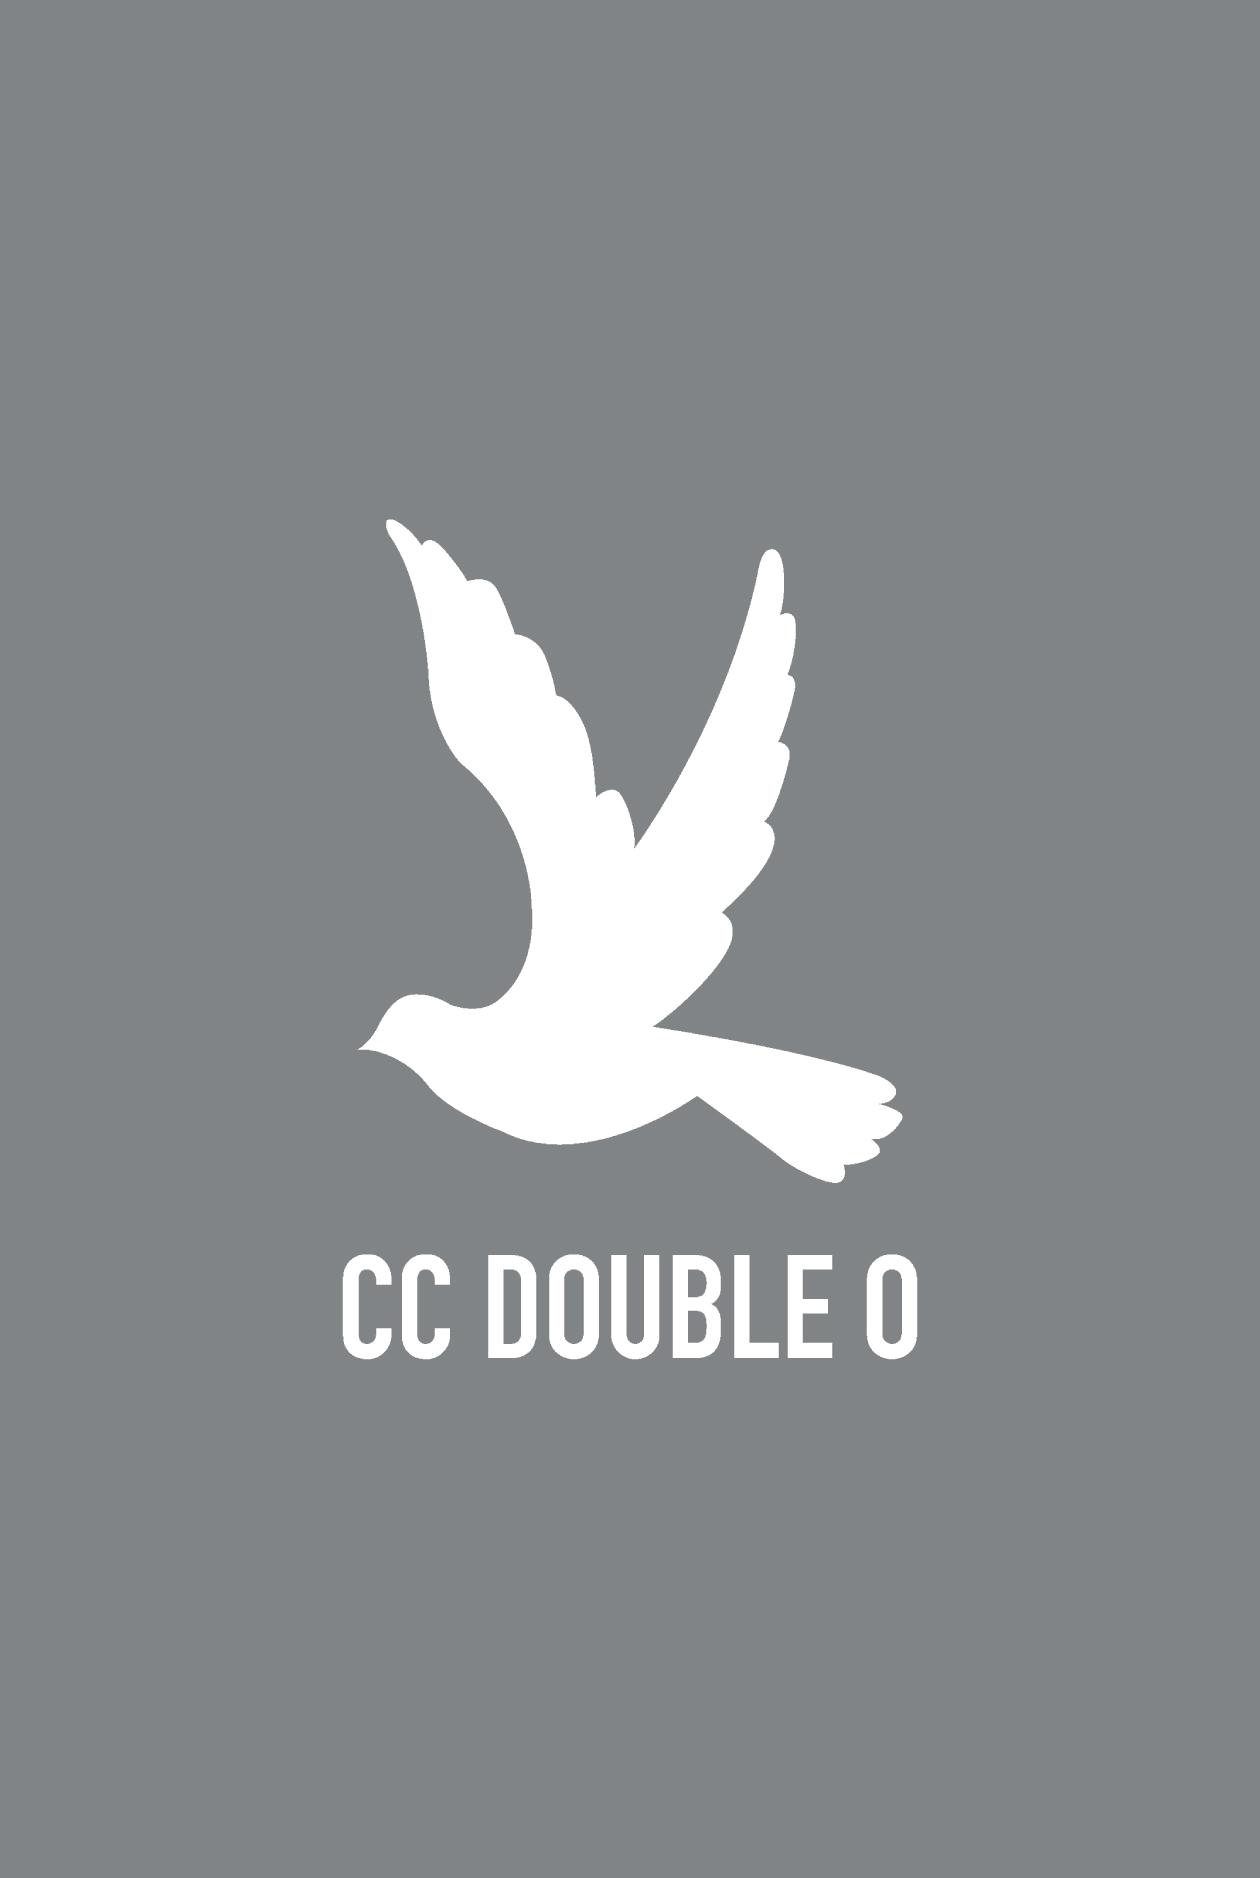 Logo and Number Swim Trunks